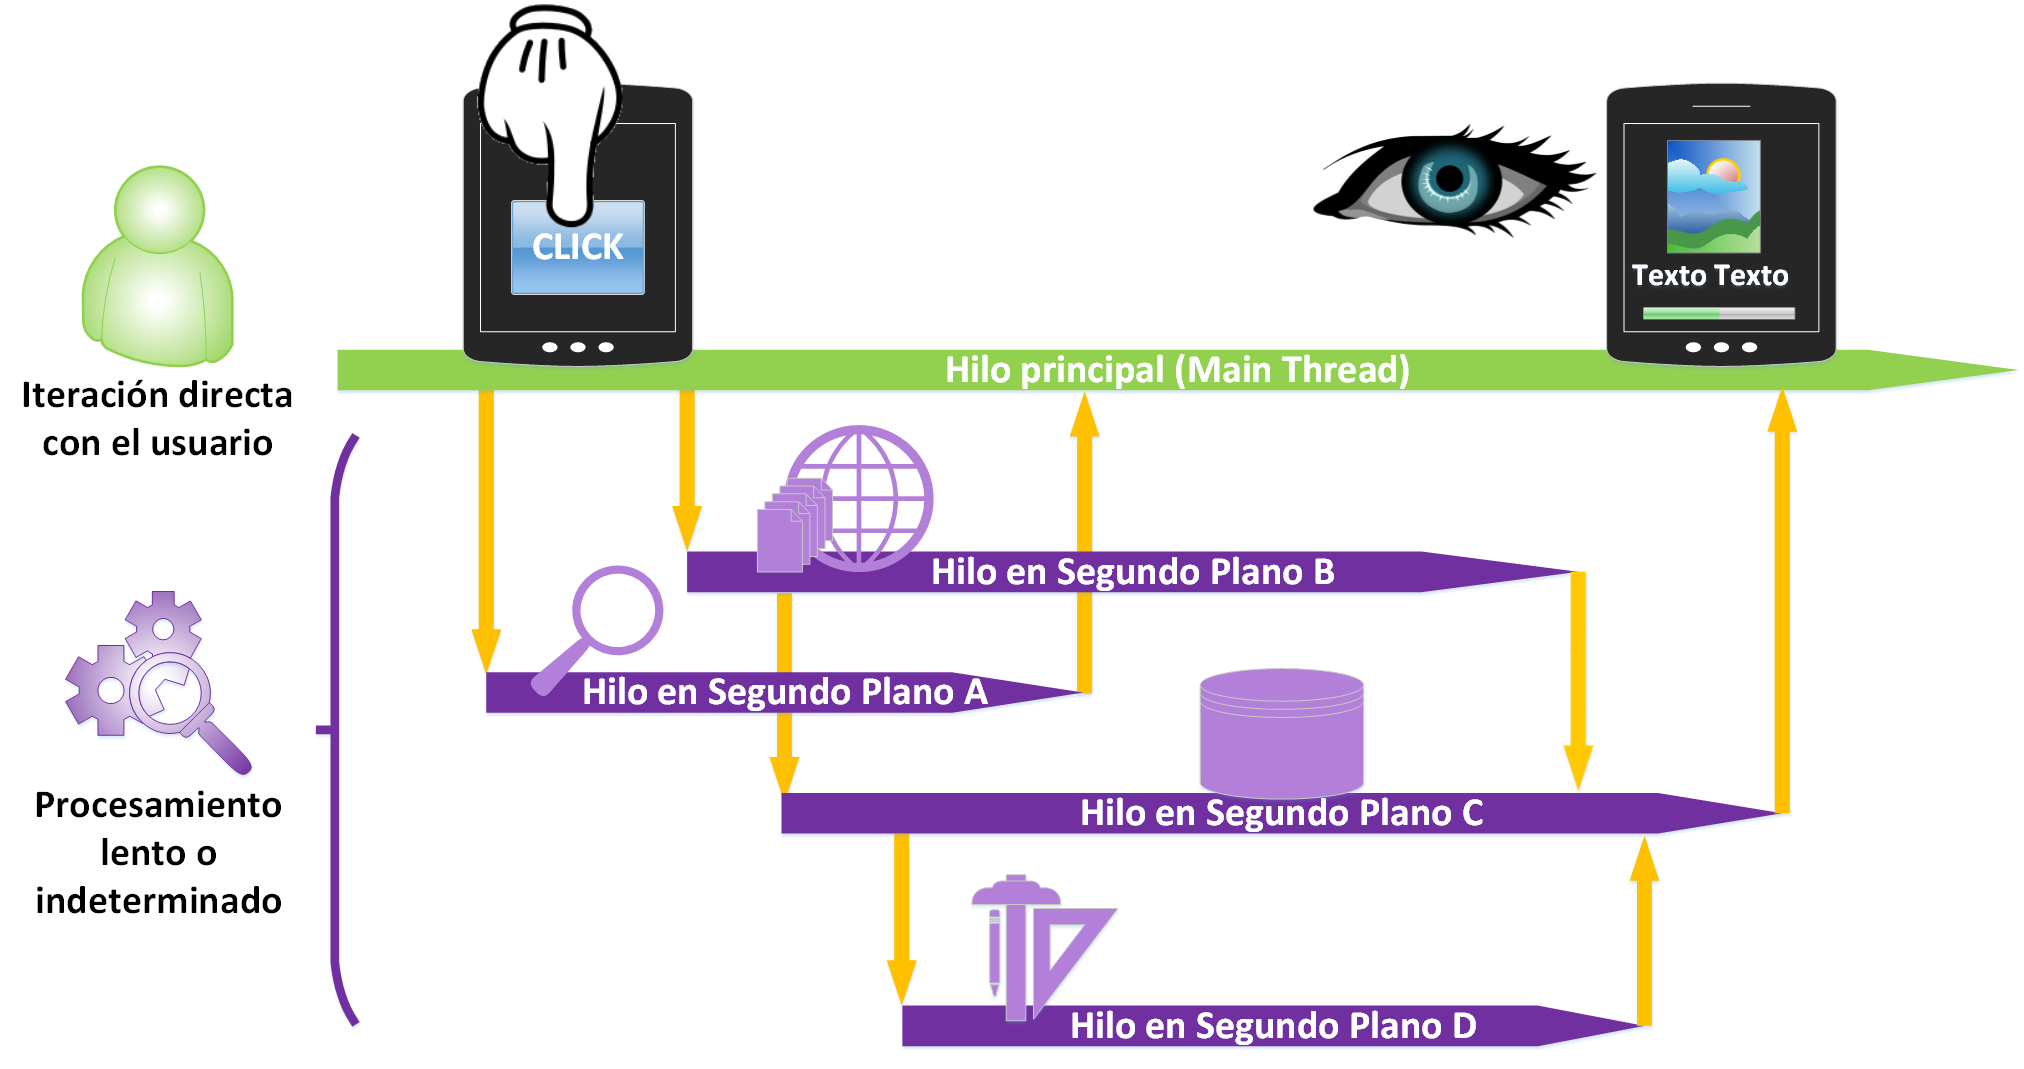 Programacion Multitarea en Android - www.Jarroba.com